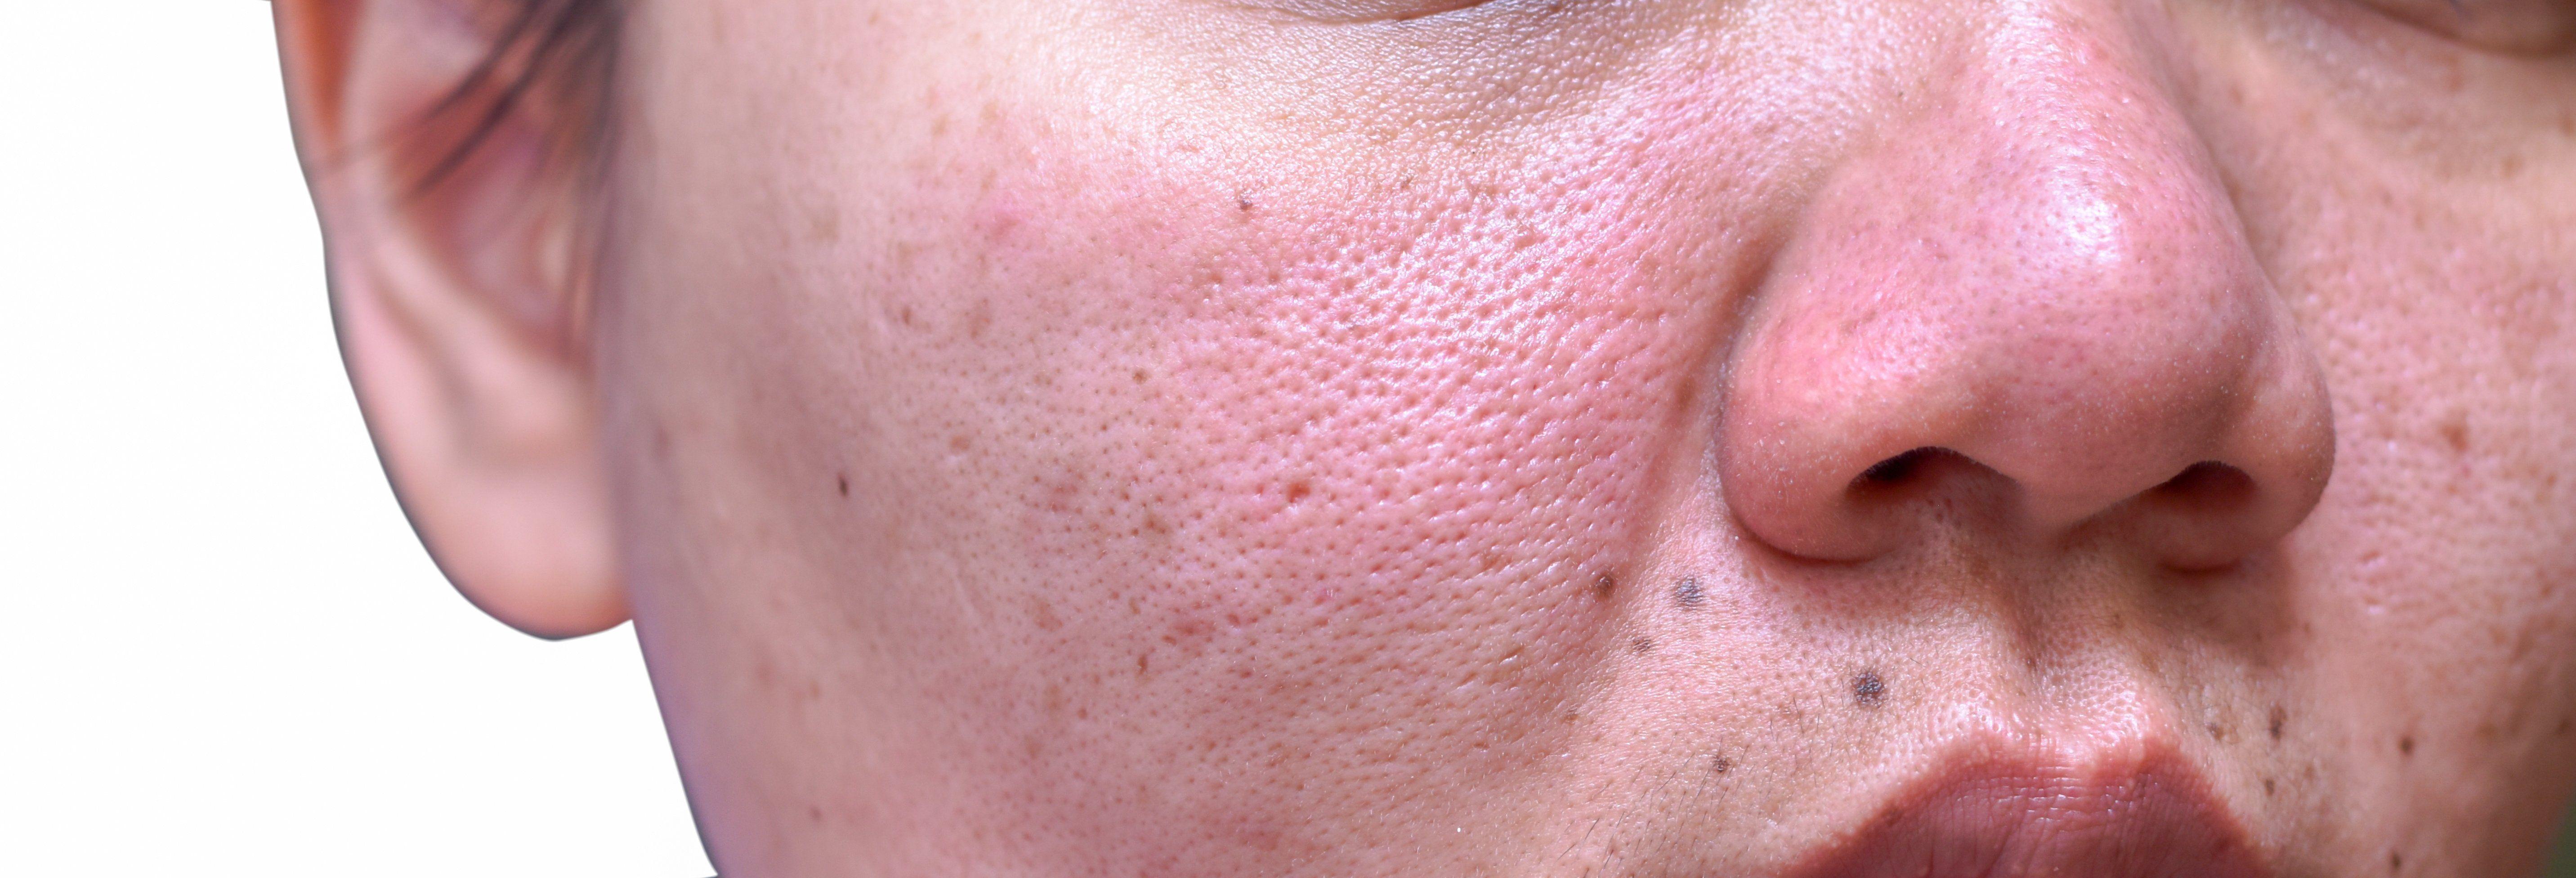 Lupus Renal Disease Mortality Rates Dip Rheumatology Network